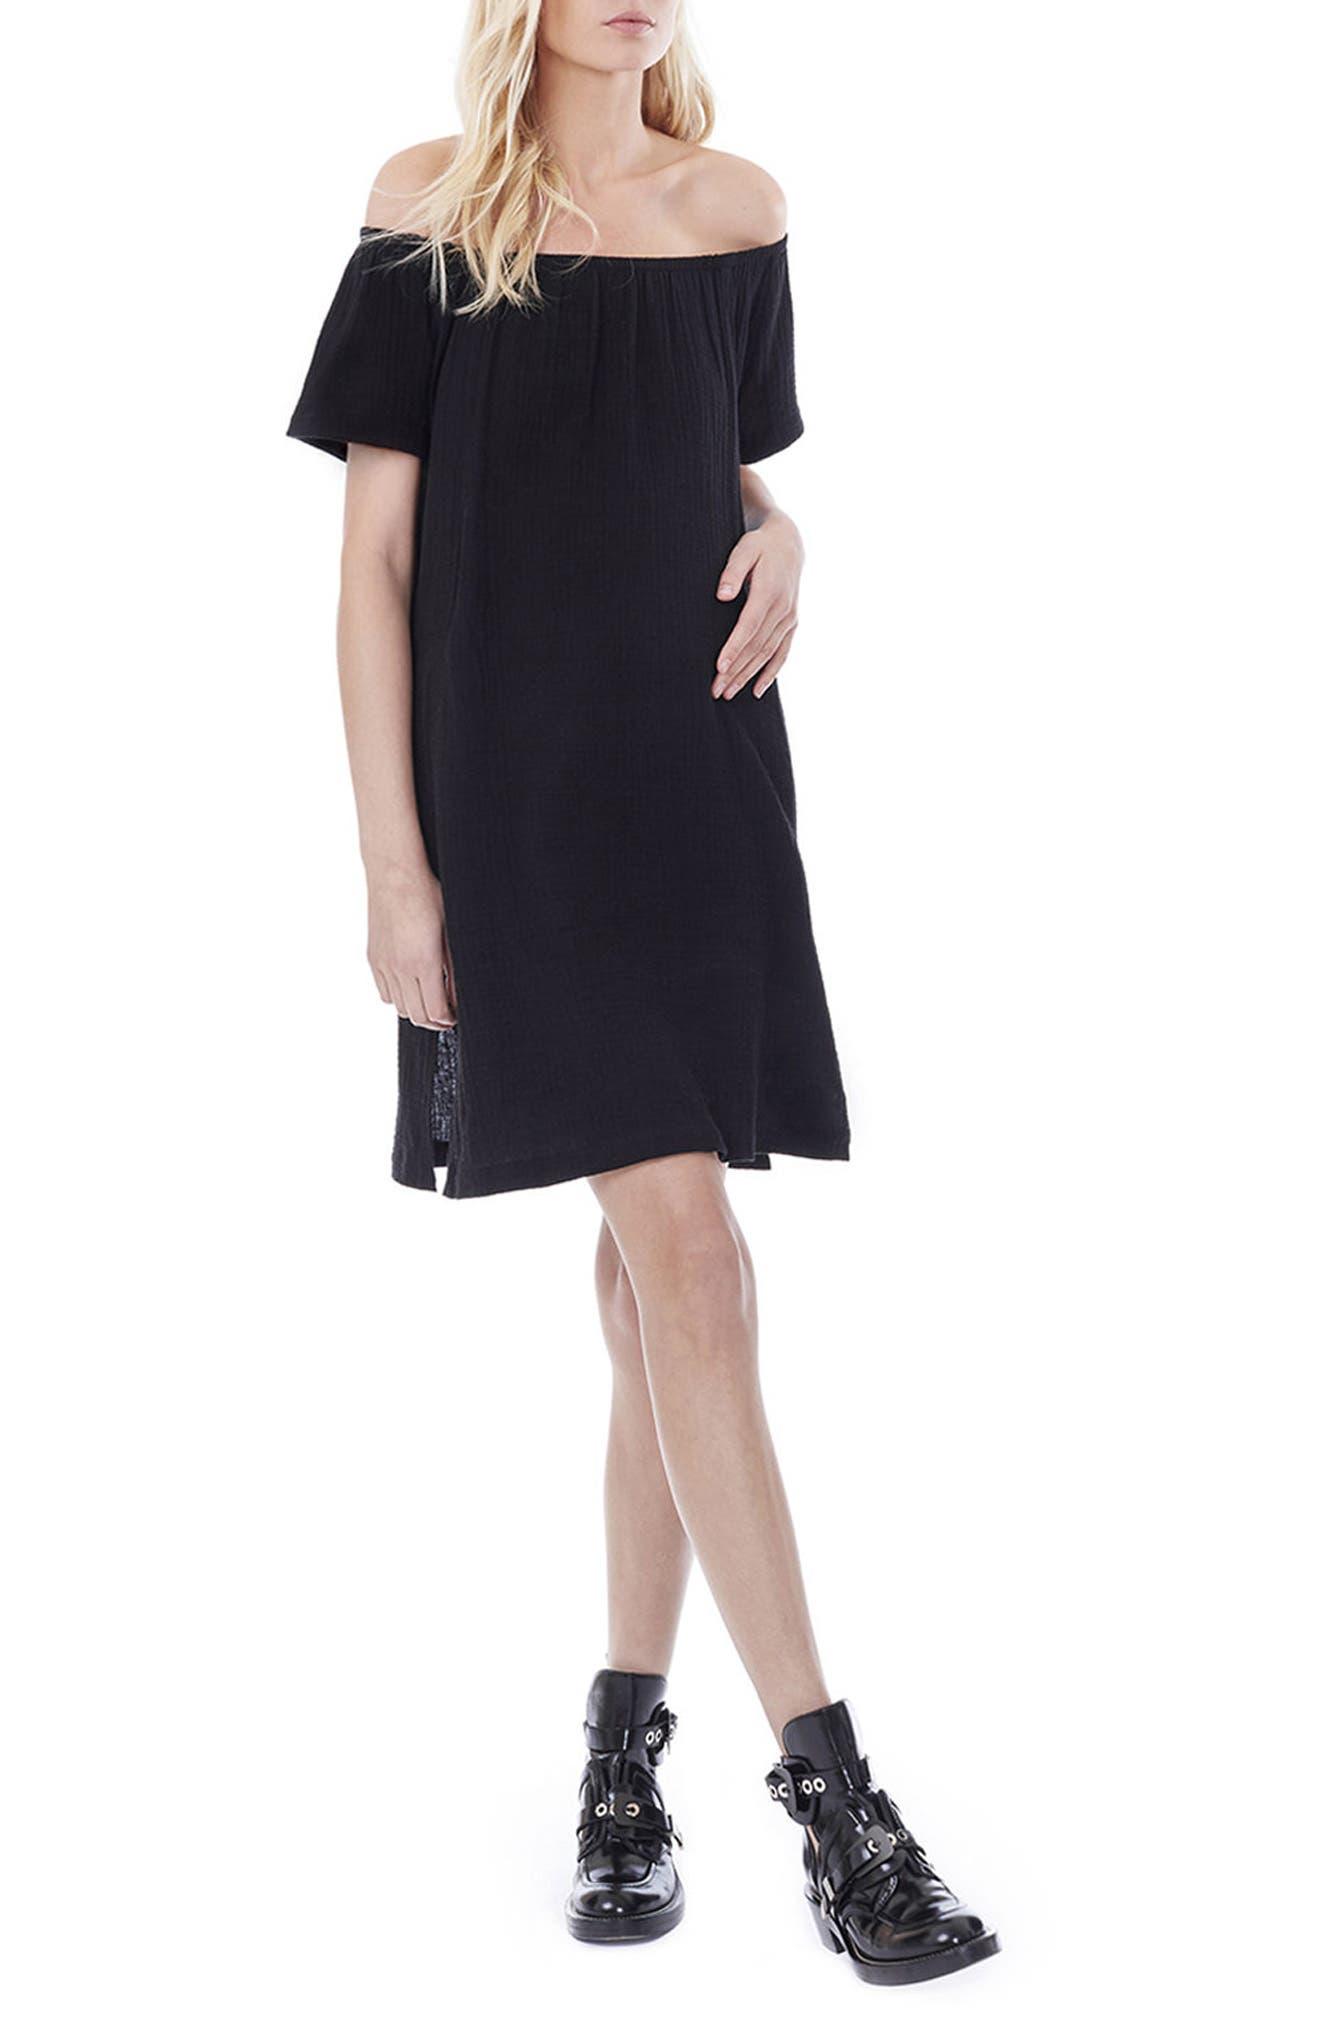 Alternate Image 1 Selected - Loyal Hana Ariel Off The Shoulder Maternity/Nursing Dress